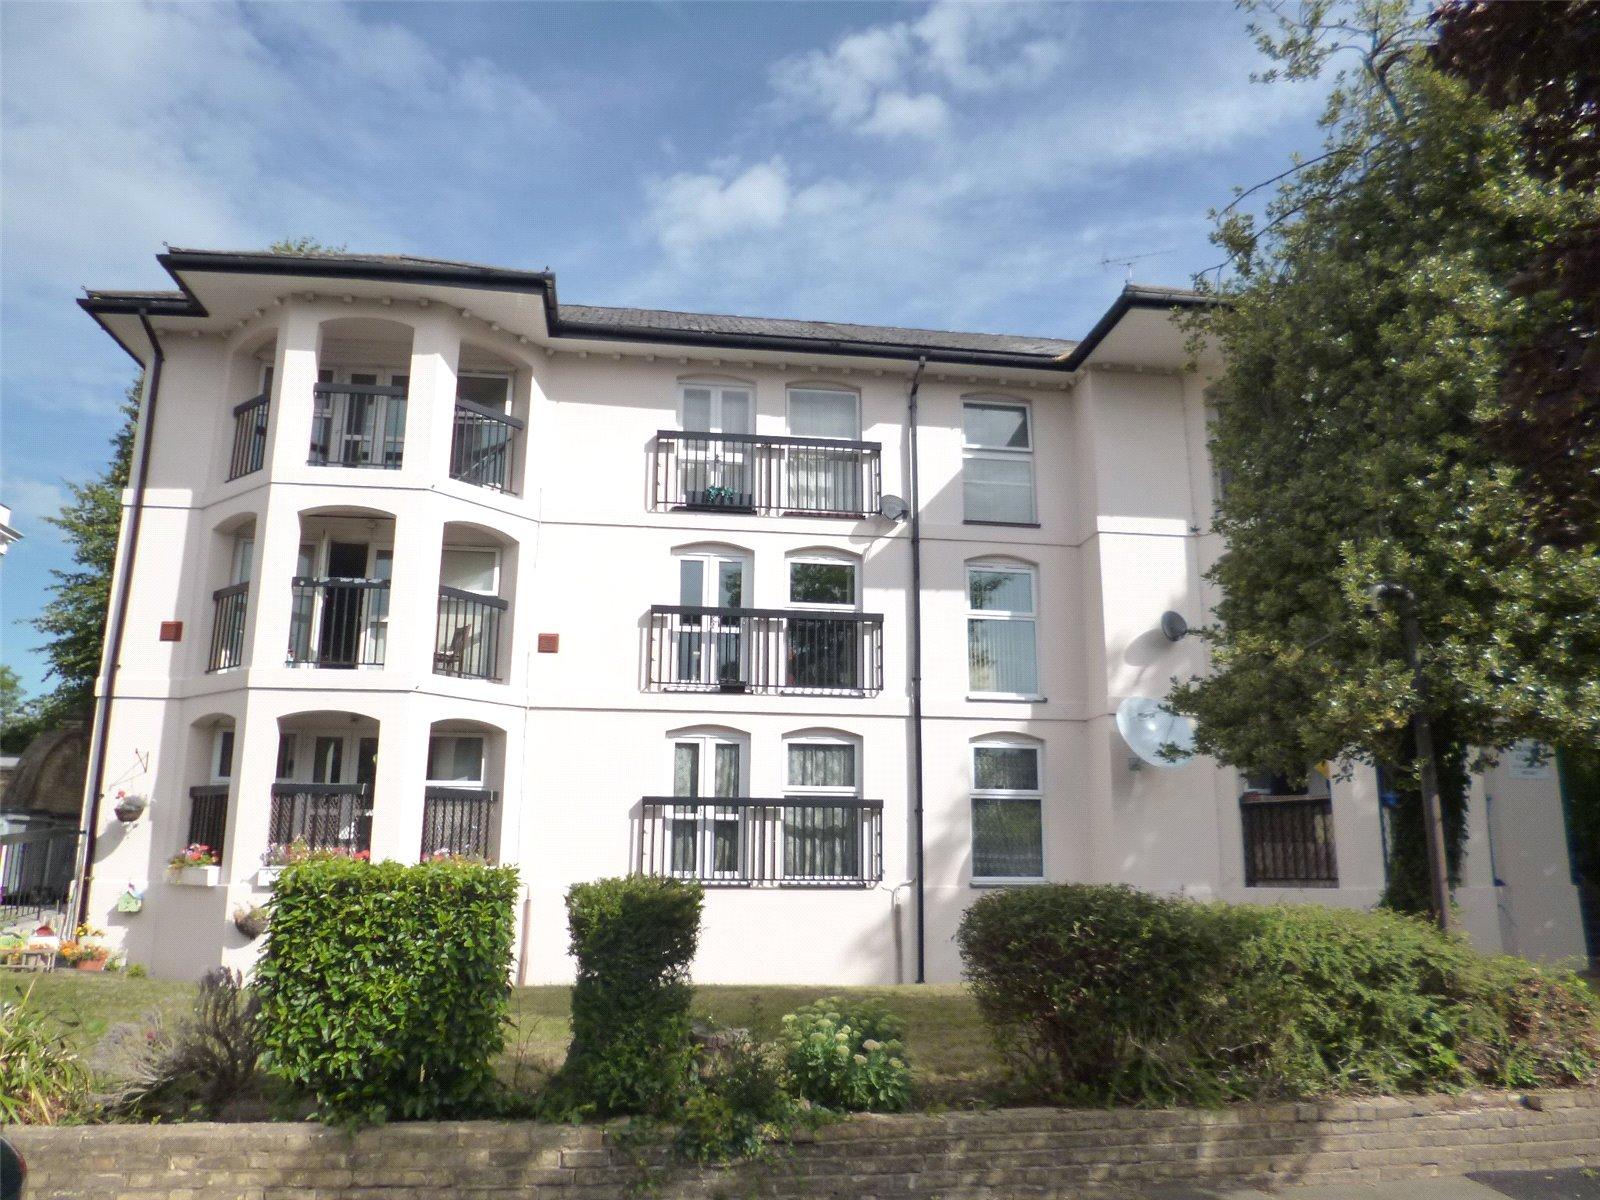 Caradon Court, Ellesmere Road, TW1 2DN - Antony Roberts